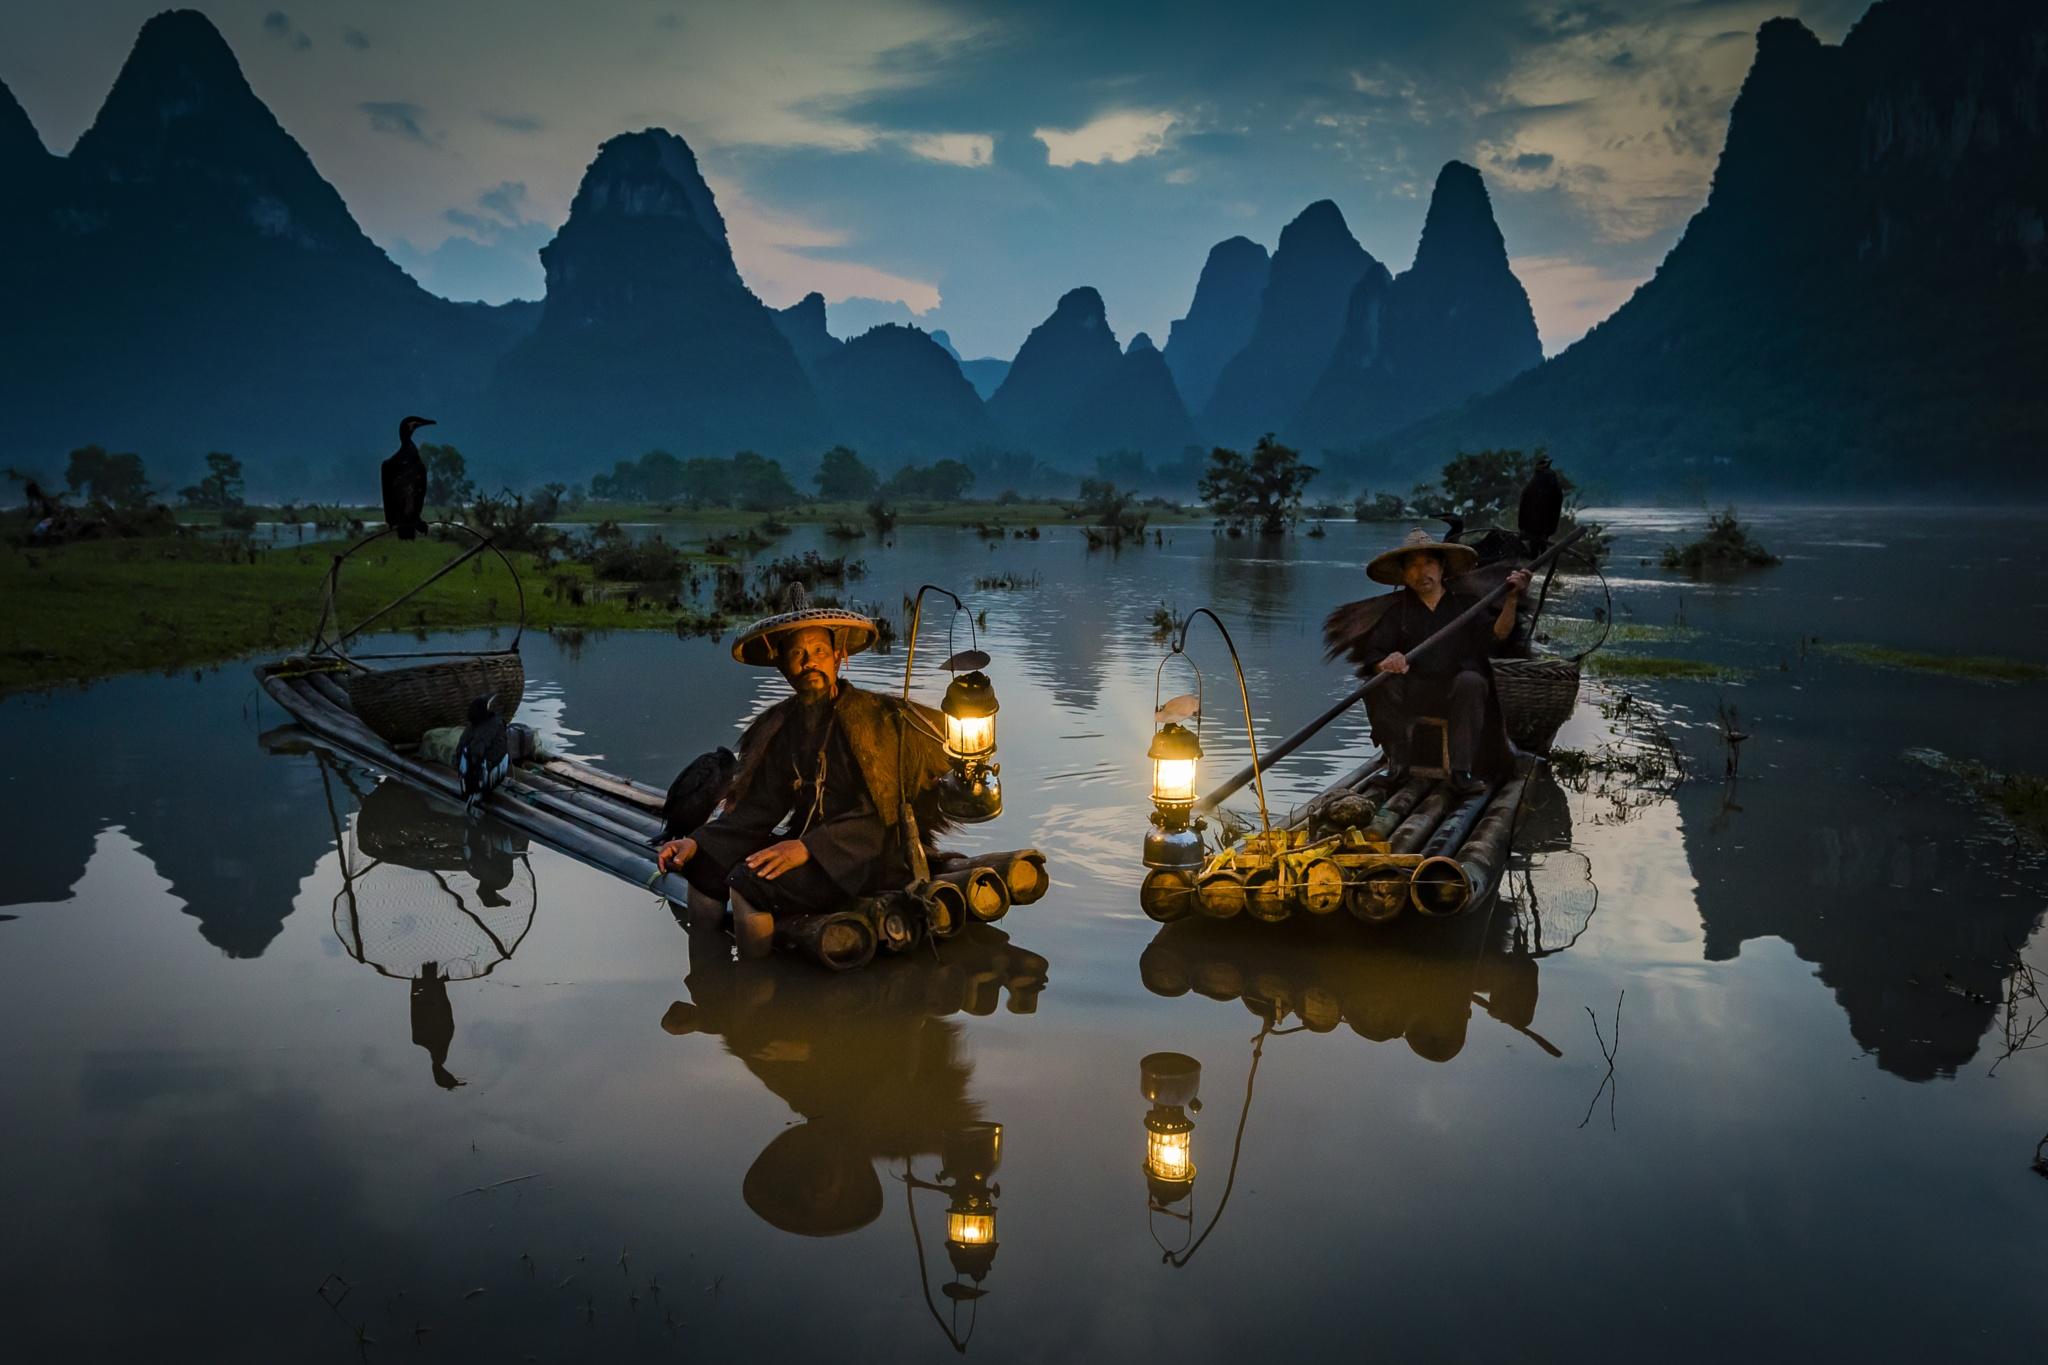 Yangshuo Fisherman by CamHadlowPhotography